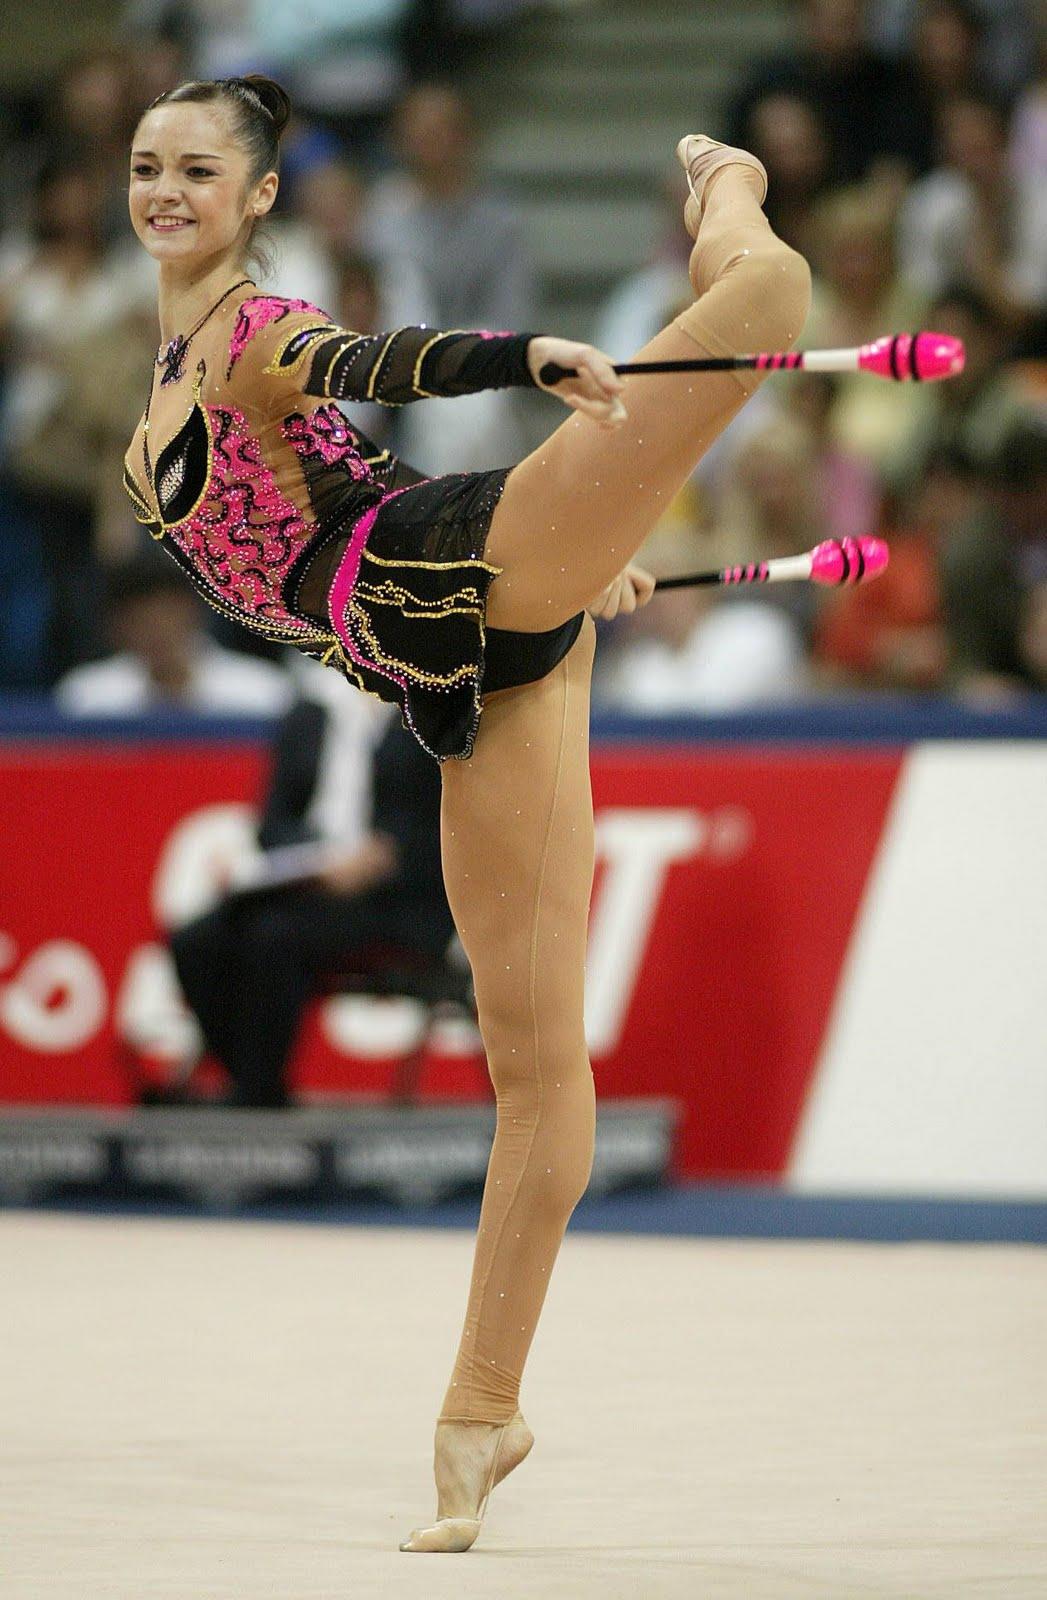 gymnastics spreading http://1.bp.blogspot.com/_xAg0XMI39z4/S8CmO2In6PI/